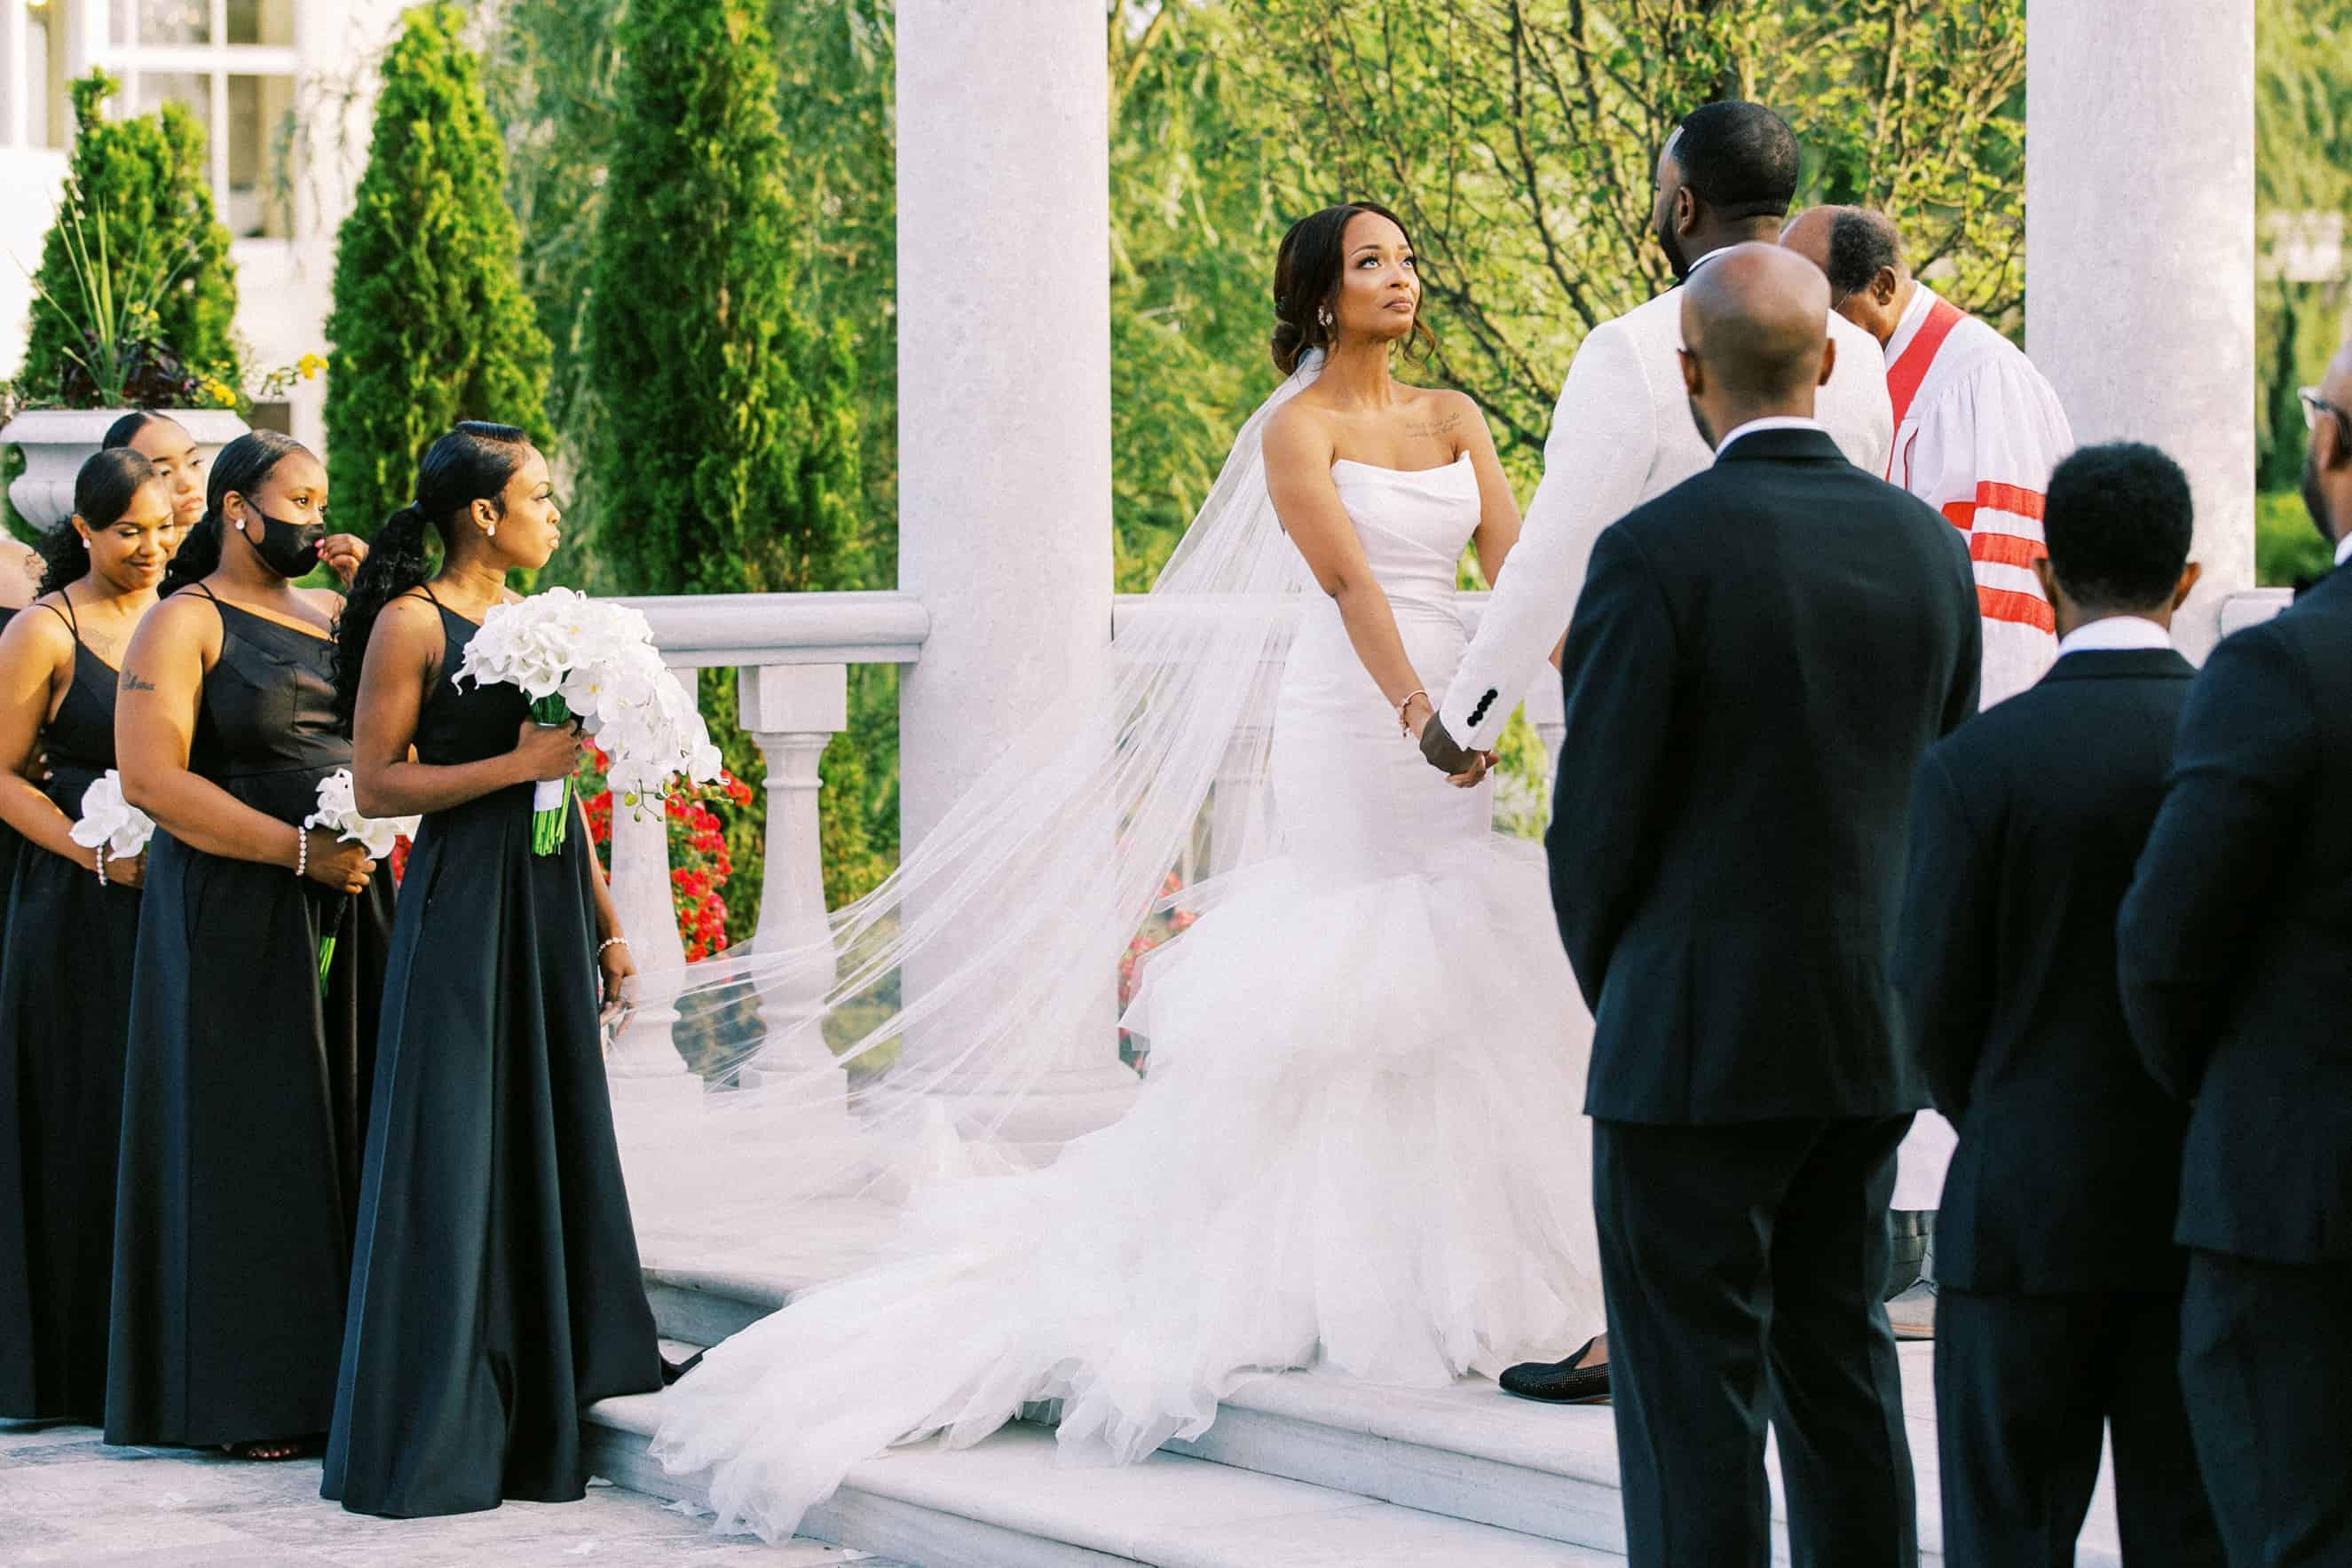 Outdoor Wedding Ceremony Locations New Jersey